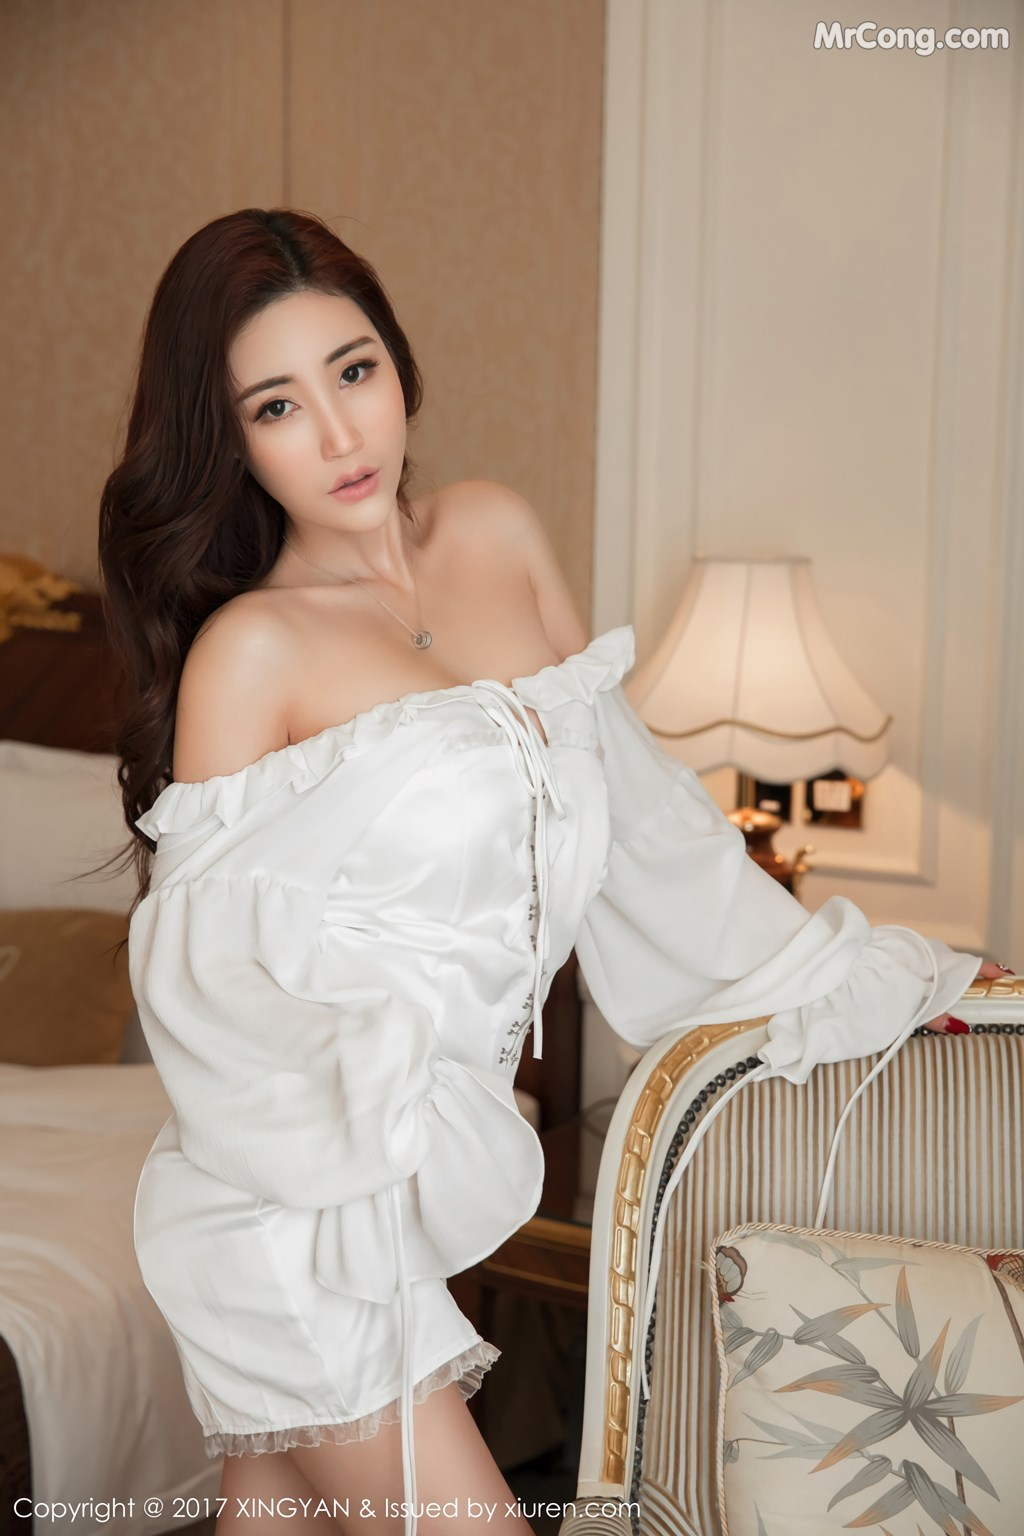 Image XingYan-Vol.001-Sun-Meng-Yao-V-MrCong.com-006 in post XingYan Vol.001: Người mẫu Sun Meng Yao (孙梦瑶V) (49 ảnh)